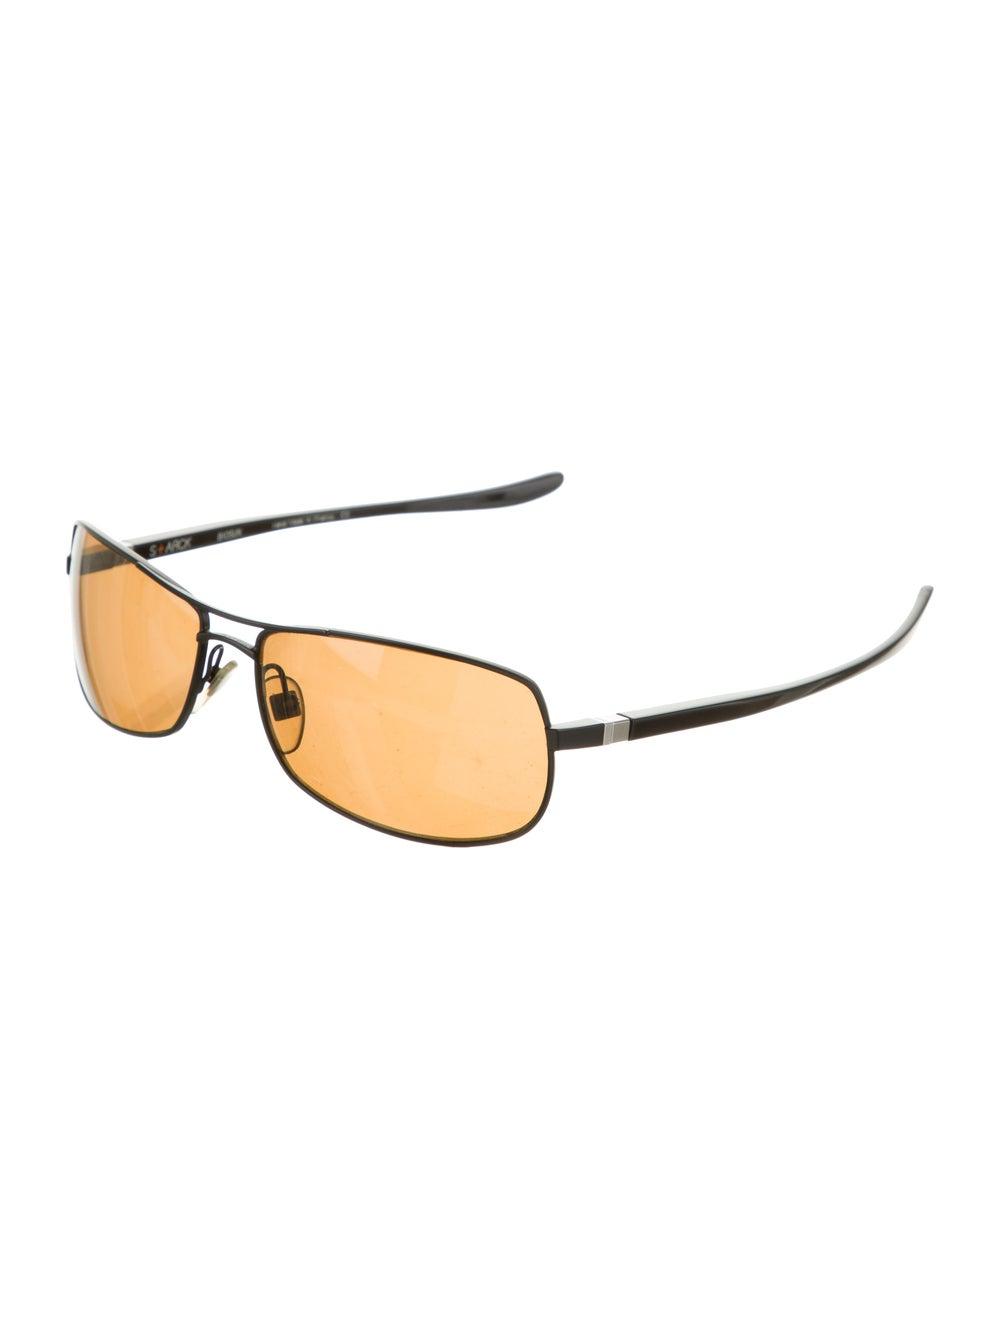 Alain Mikli Square Aviator Sunglasses brown - image 2